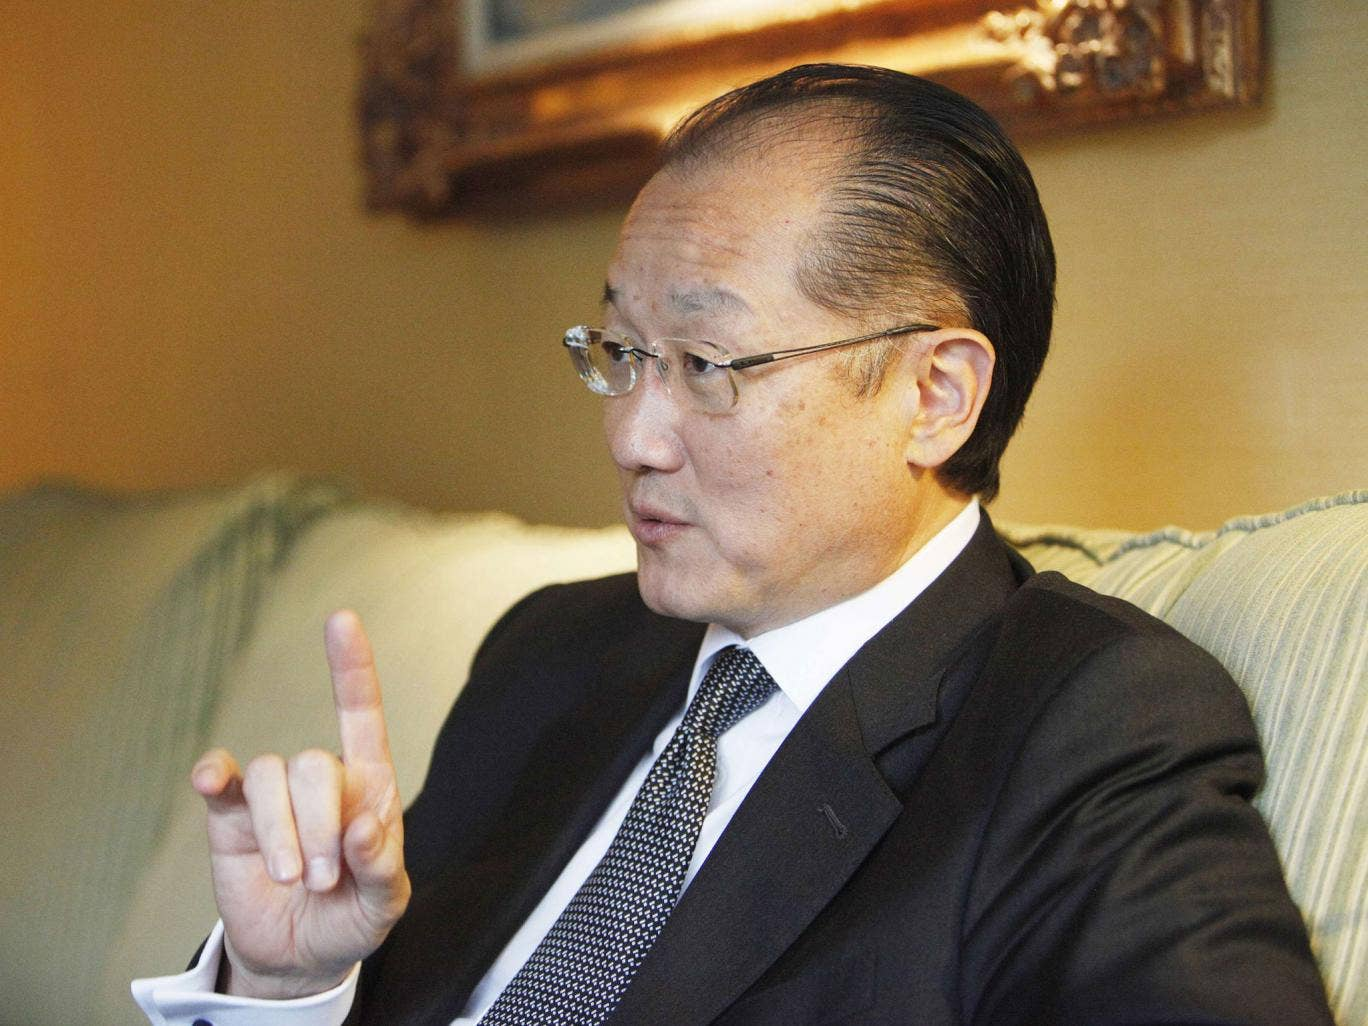 Jim Yong Kim: determined to make an impact